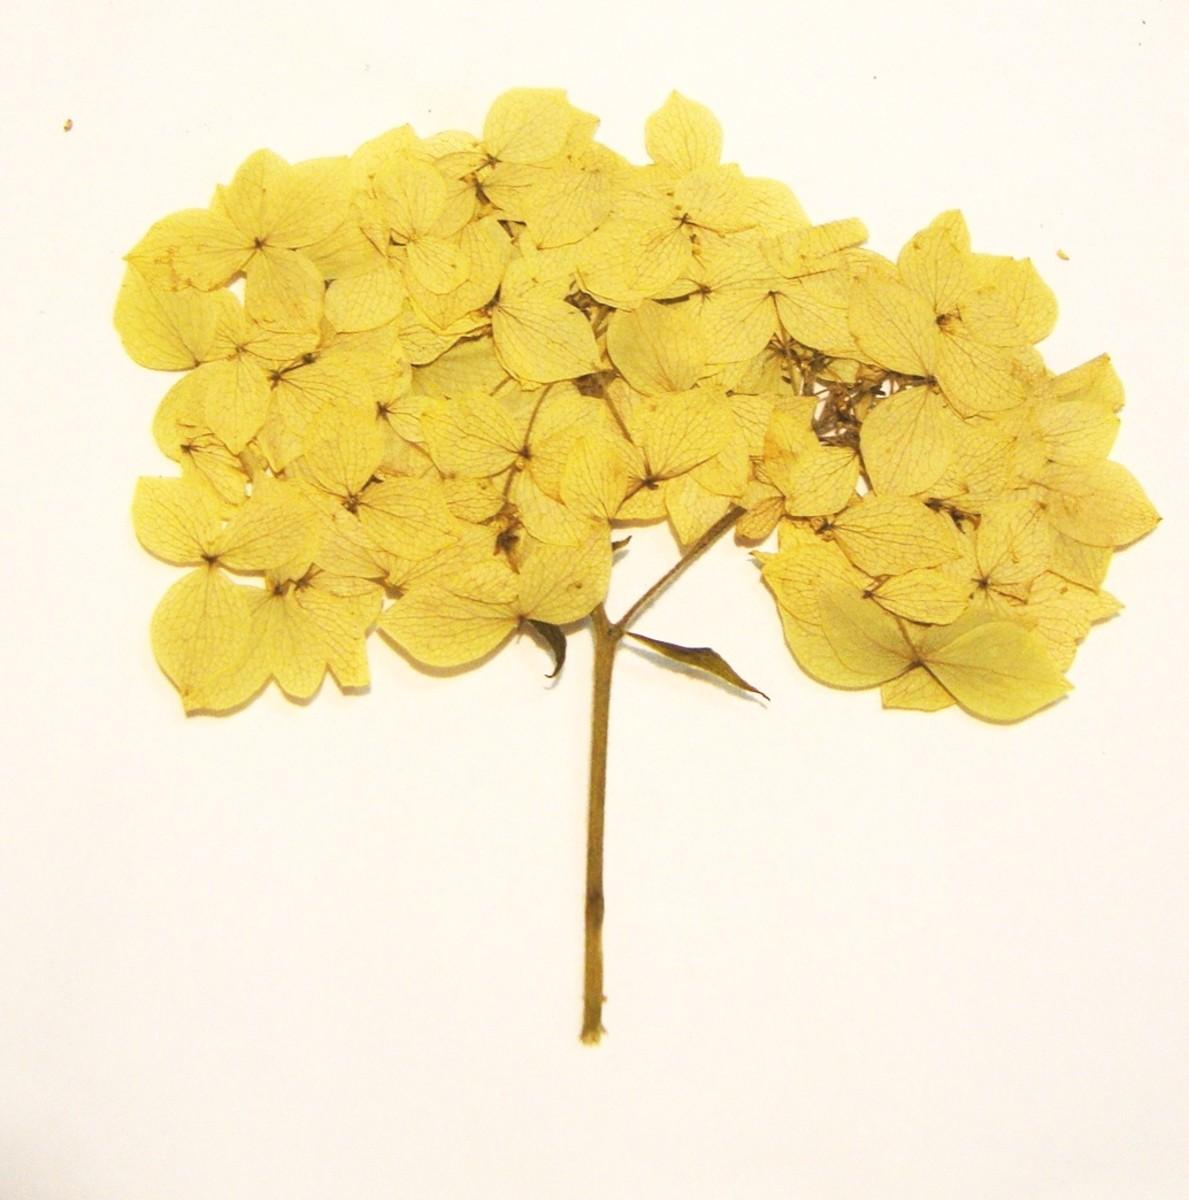 Image: Pressed Dogwood Bush Flower Head